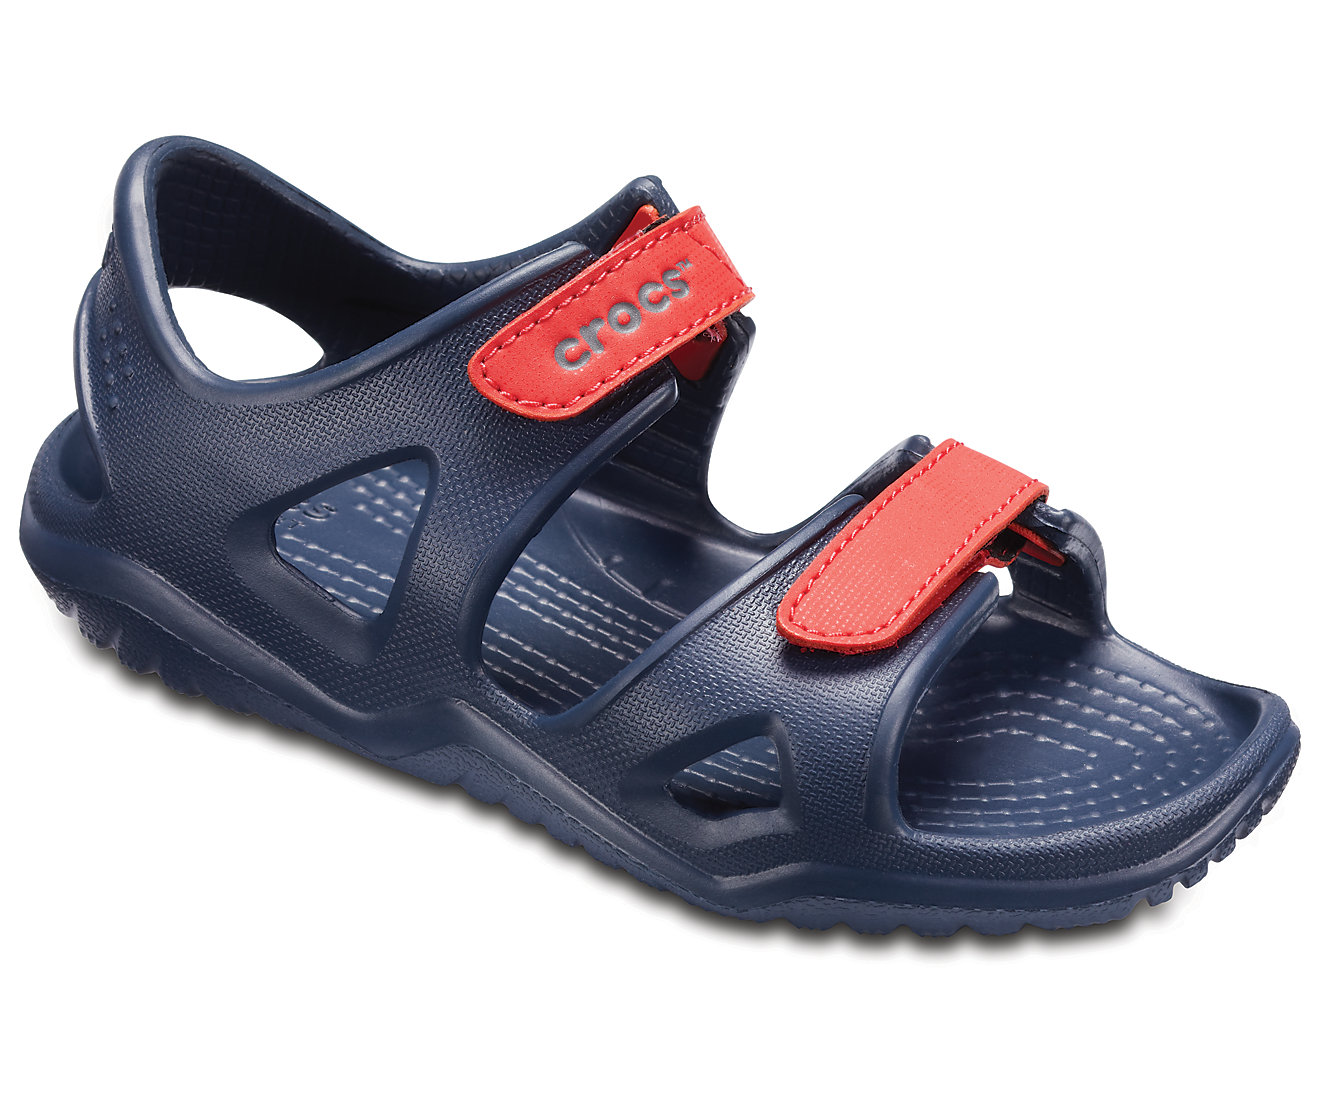 ecf1b65b109 -20% Yfantidis CROCS Kids' Swiftwater River Sandals 204988 NAVY/FLAME Μπλε  σκούρο